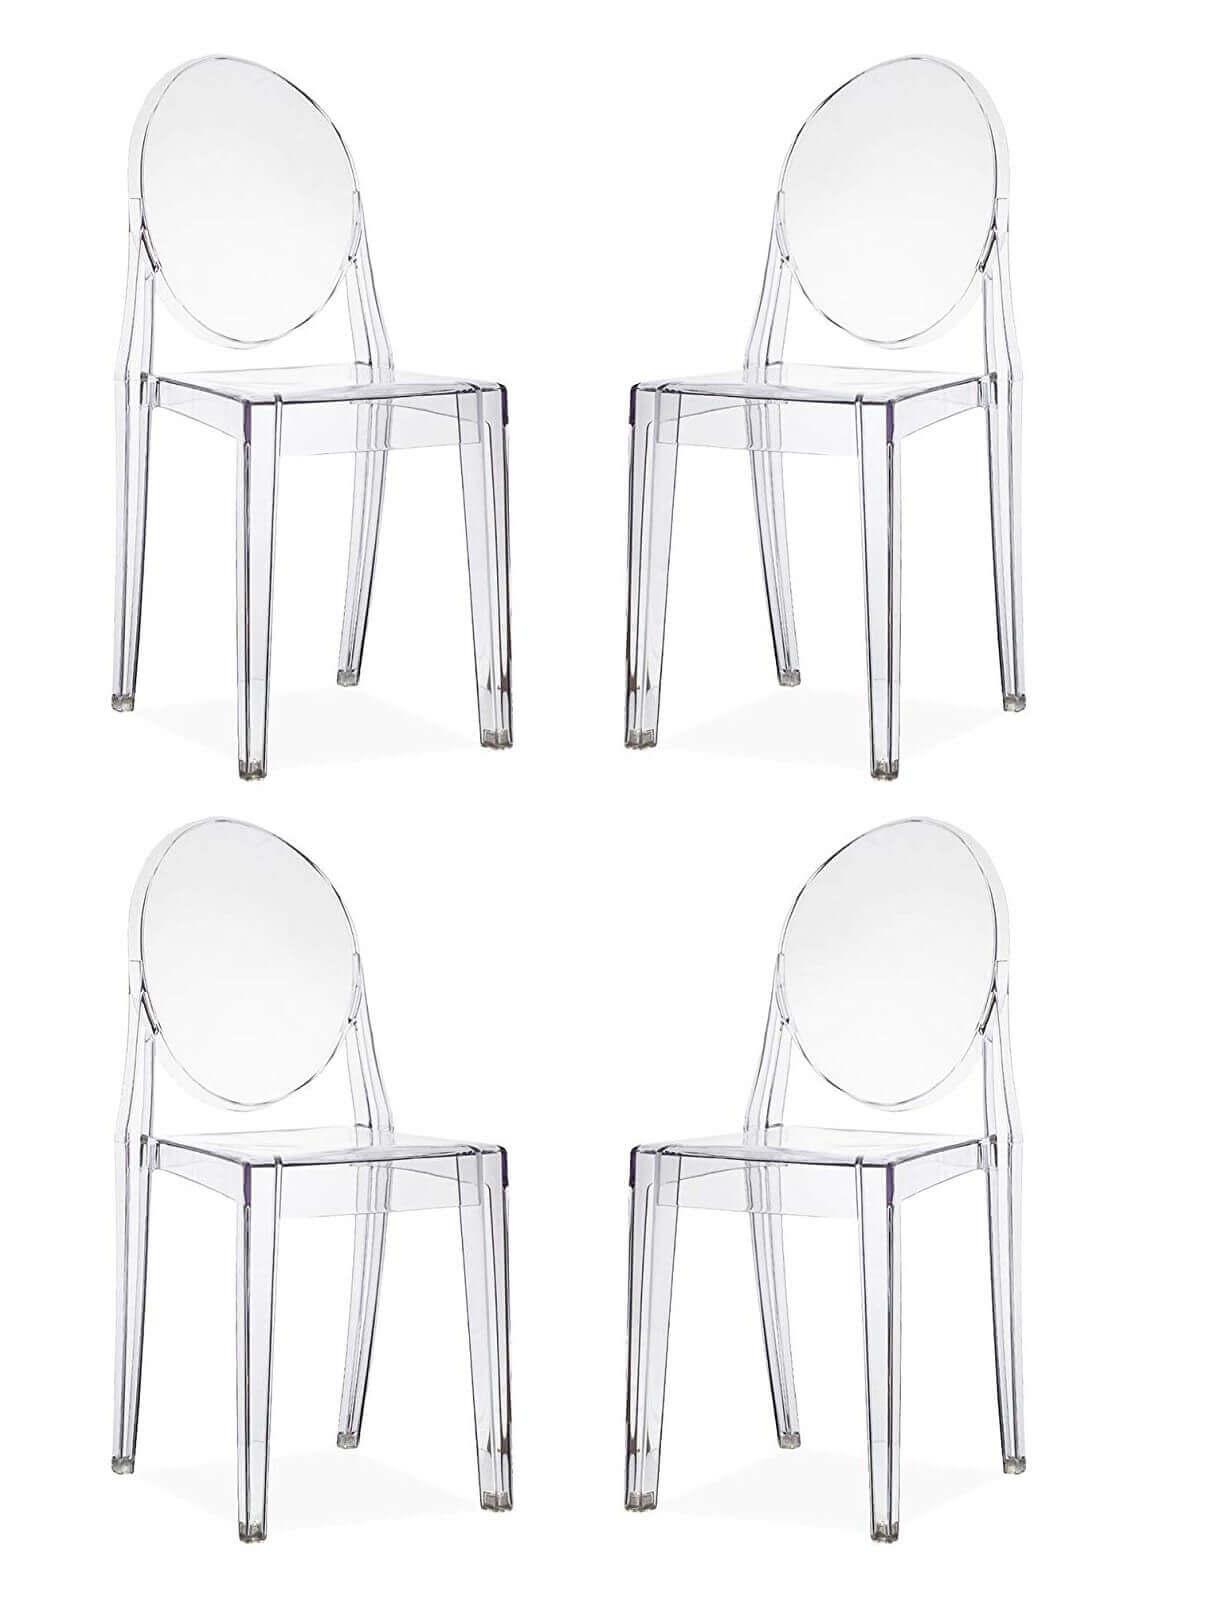 MÉLODIE - set di 4 sedie in policarbonato trasparente